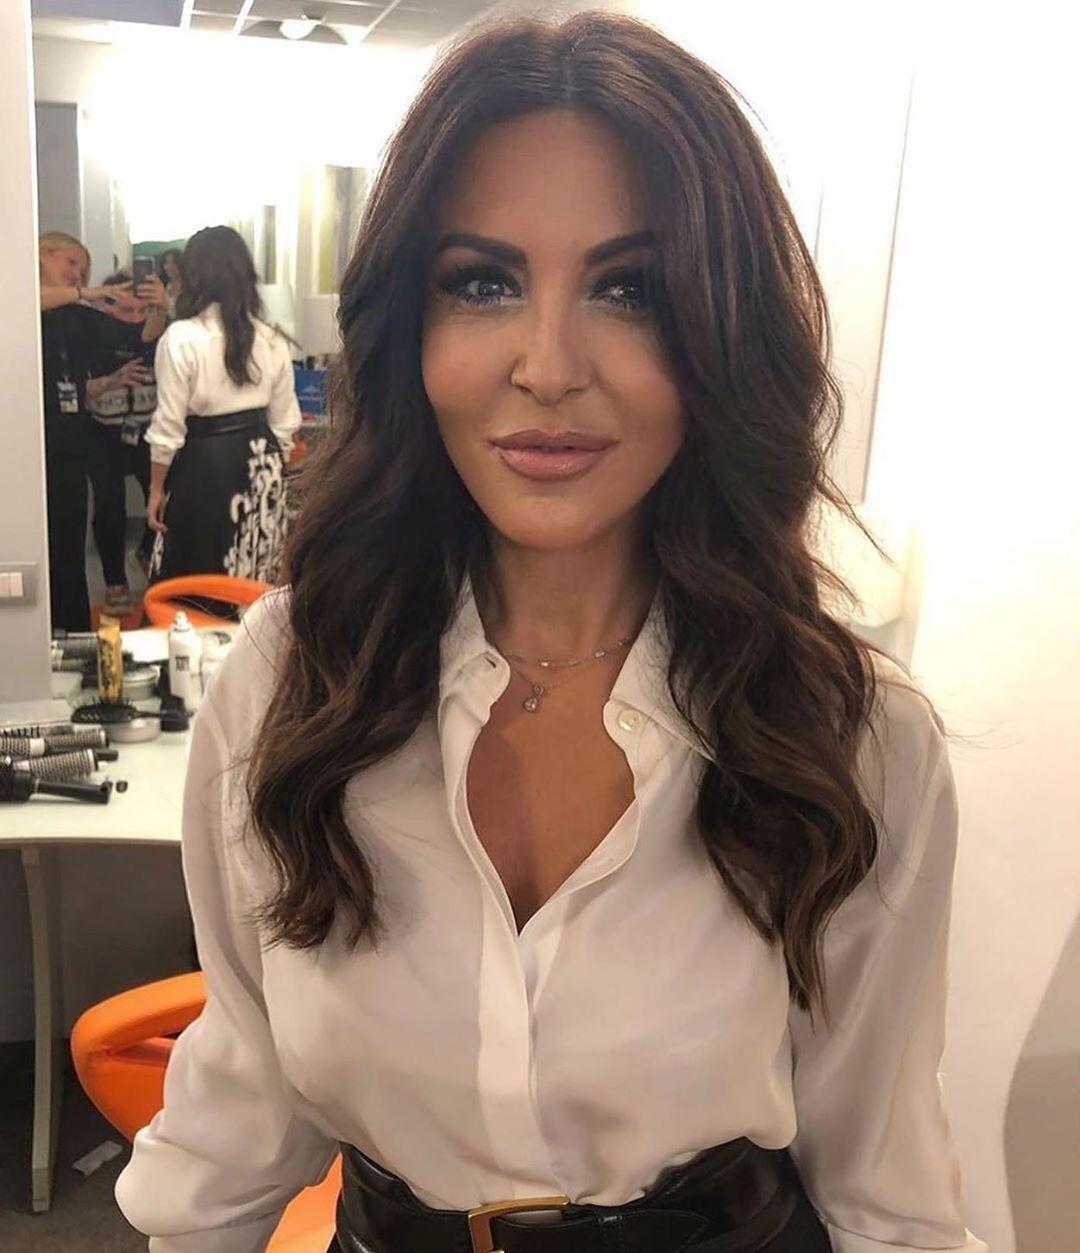 Sabrina Ferilli entra nel cast di Tu Si Que Vales: sarà